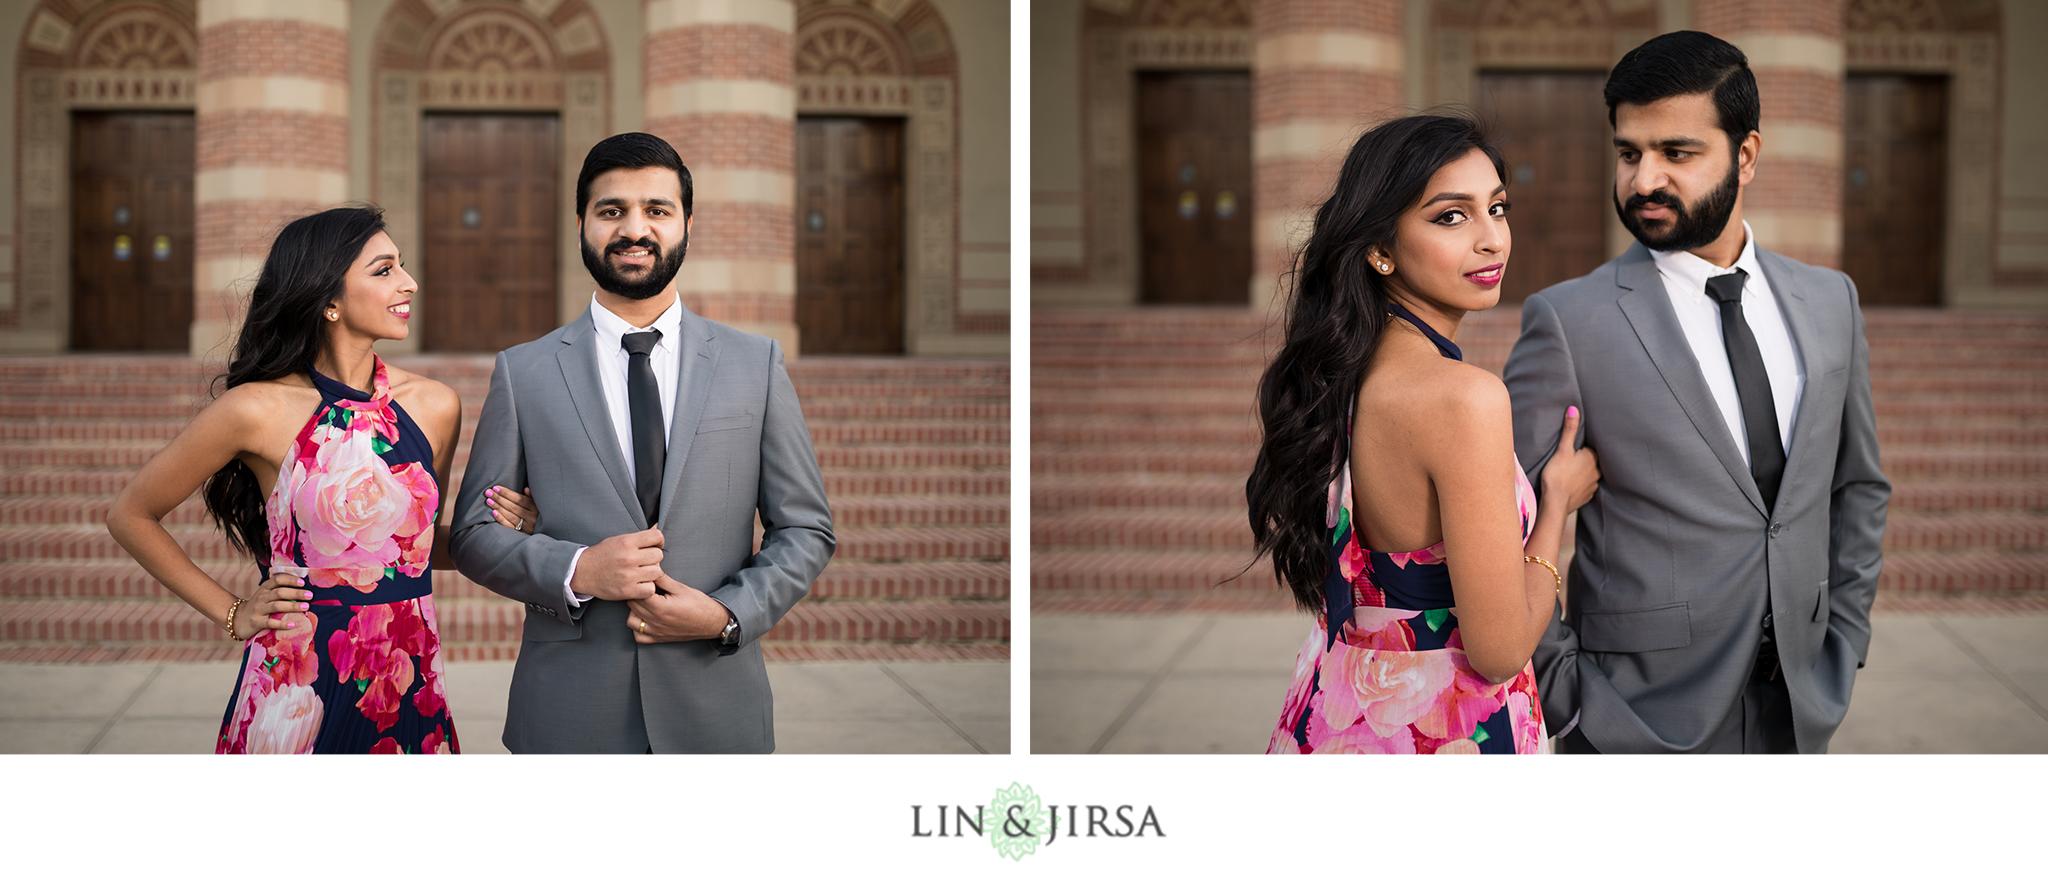 18-UCLA-Los-Angeles-Engagement-Photography